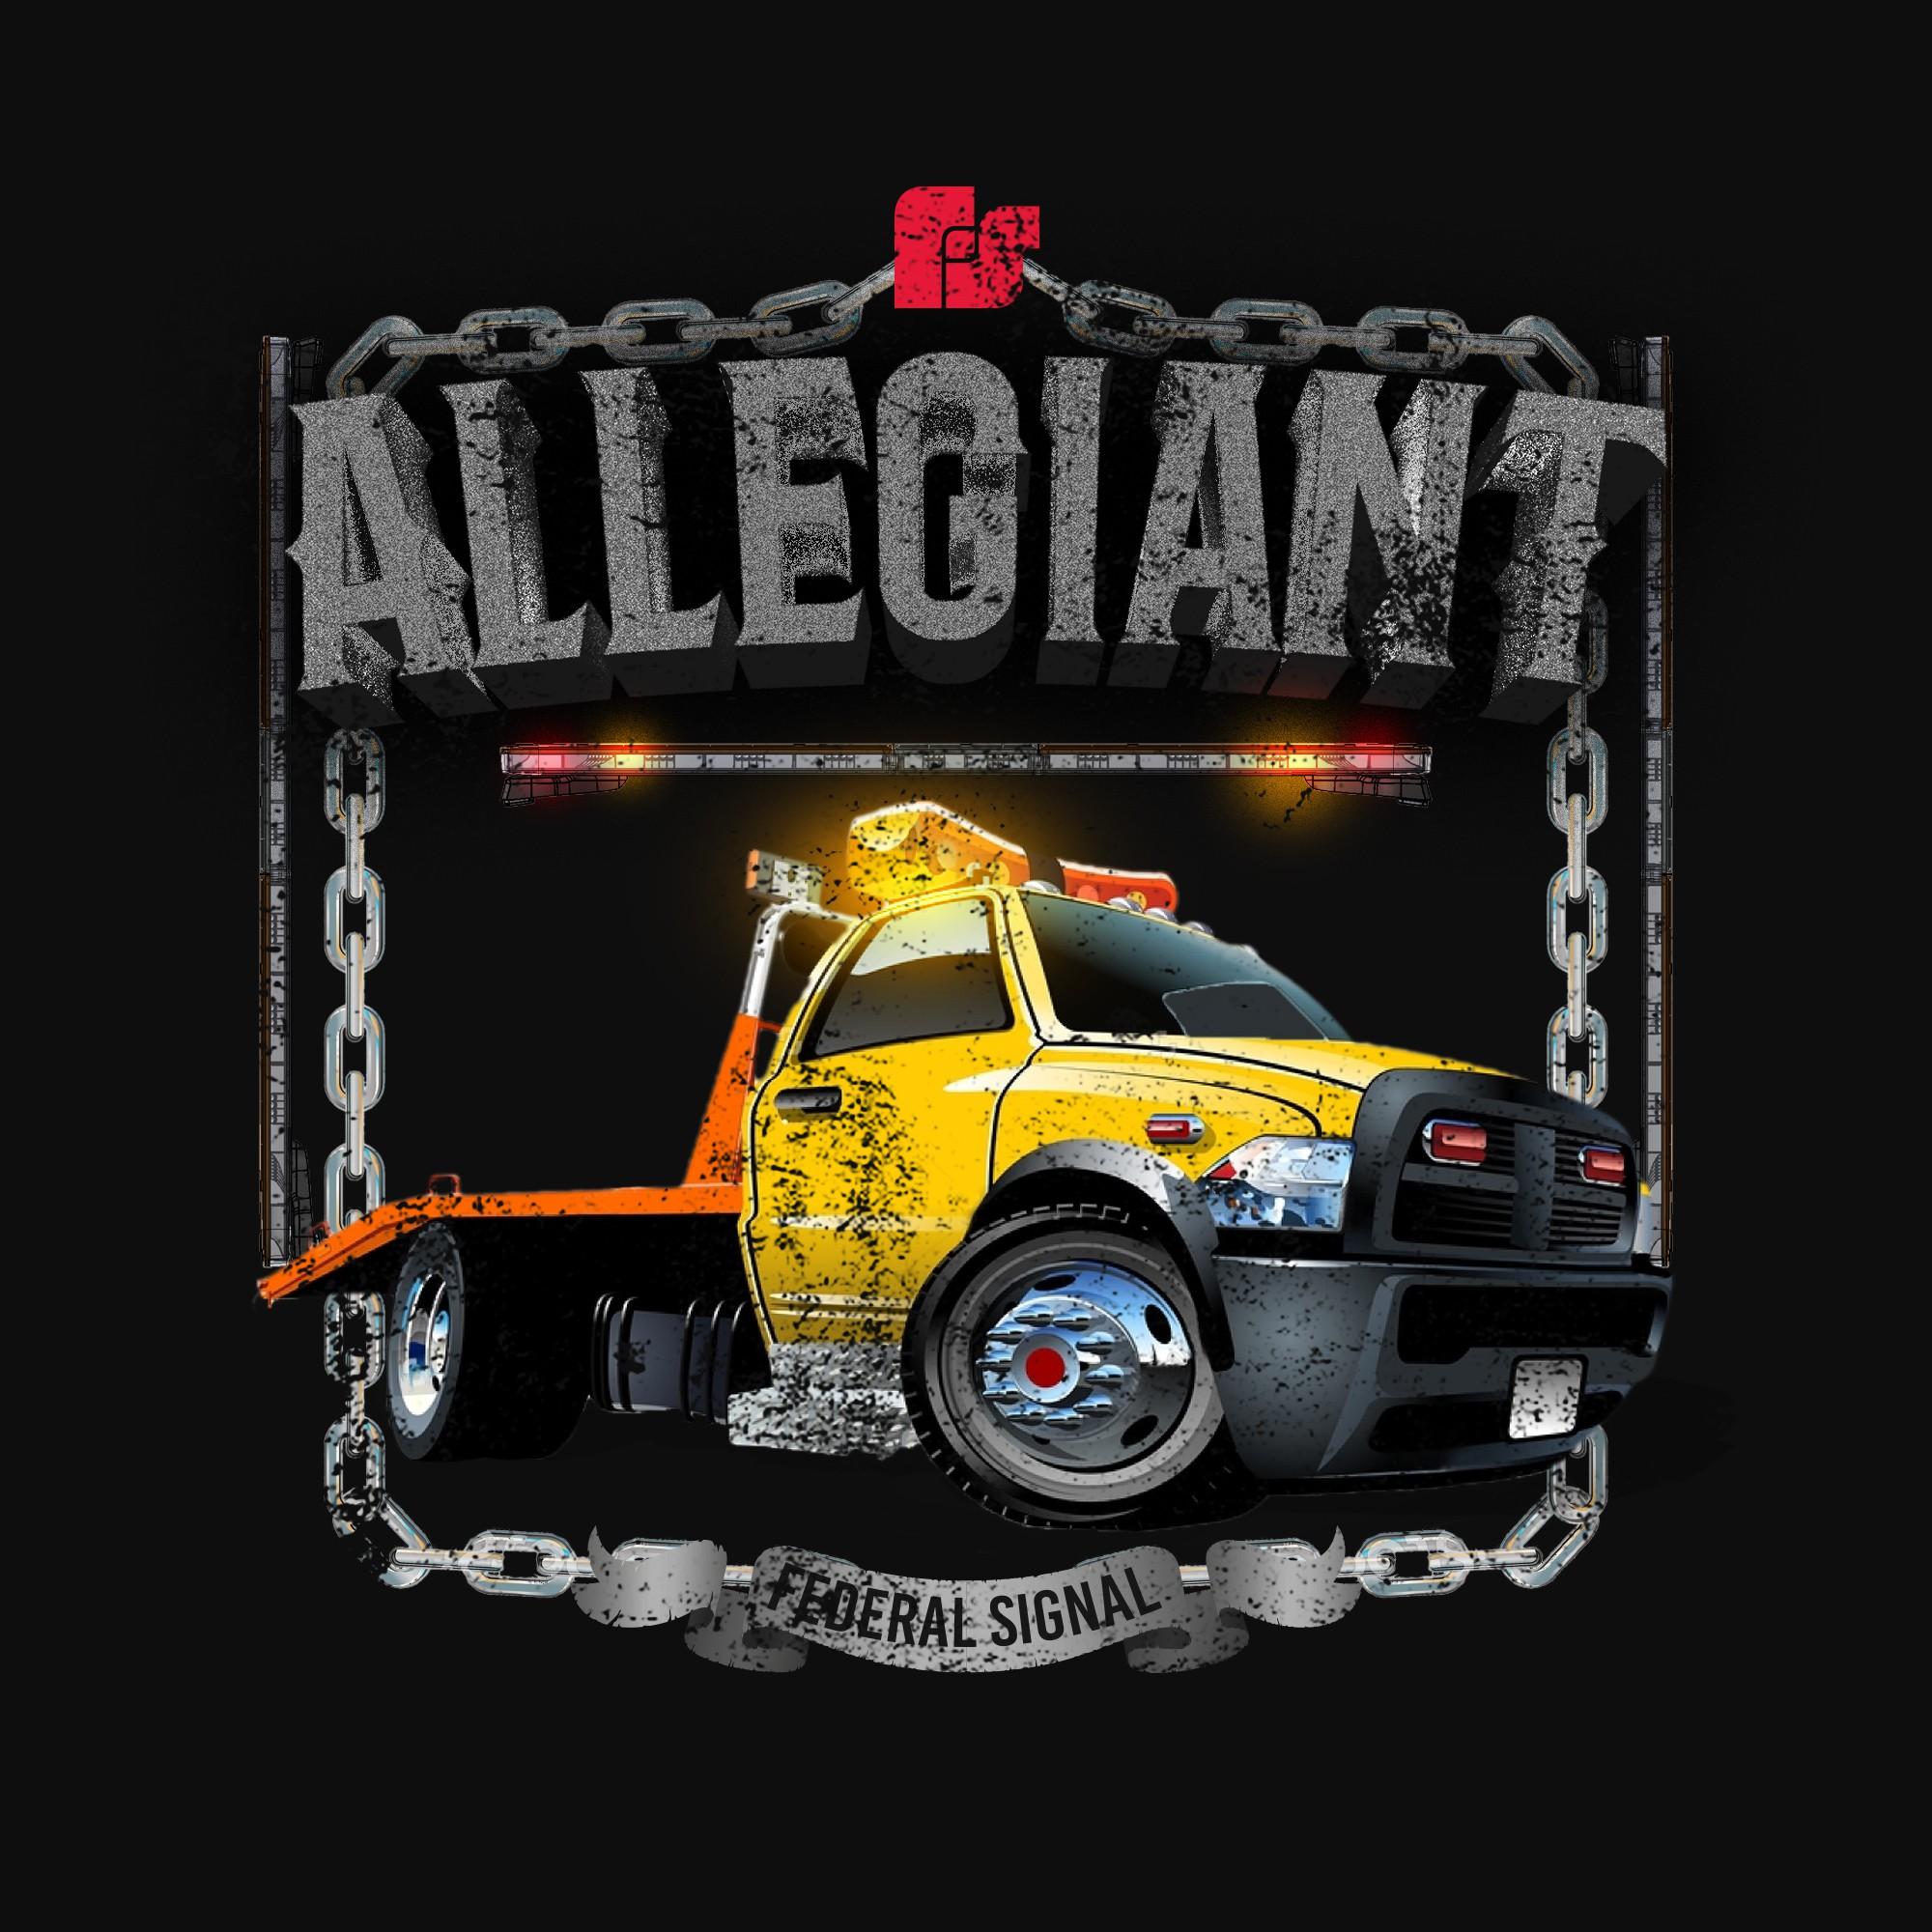 Emergency vehicle lightbar t-shirt design